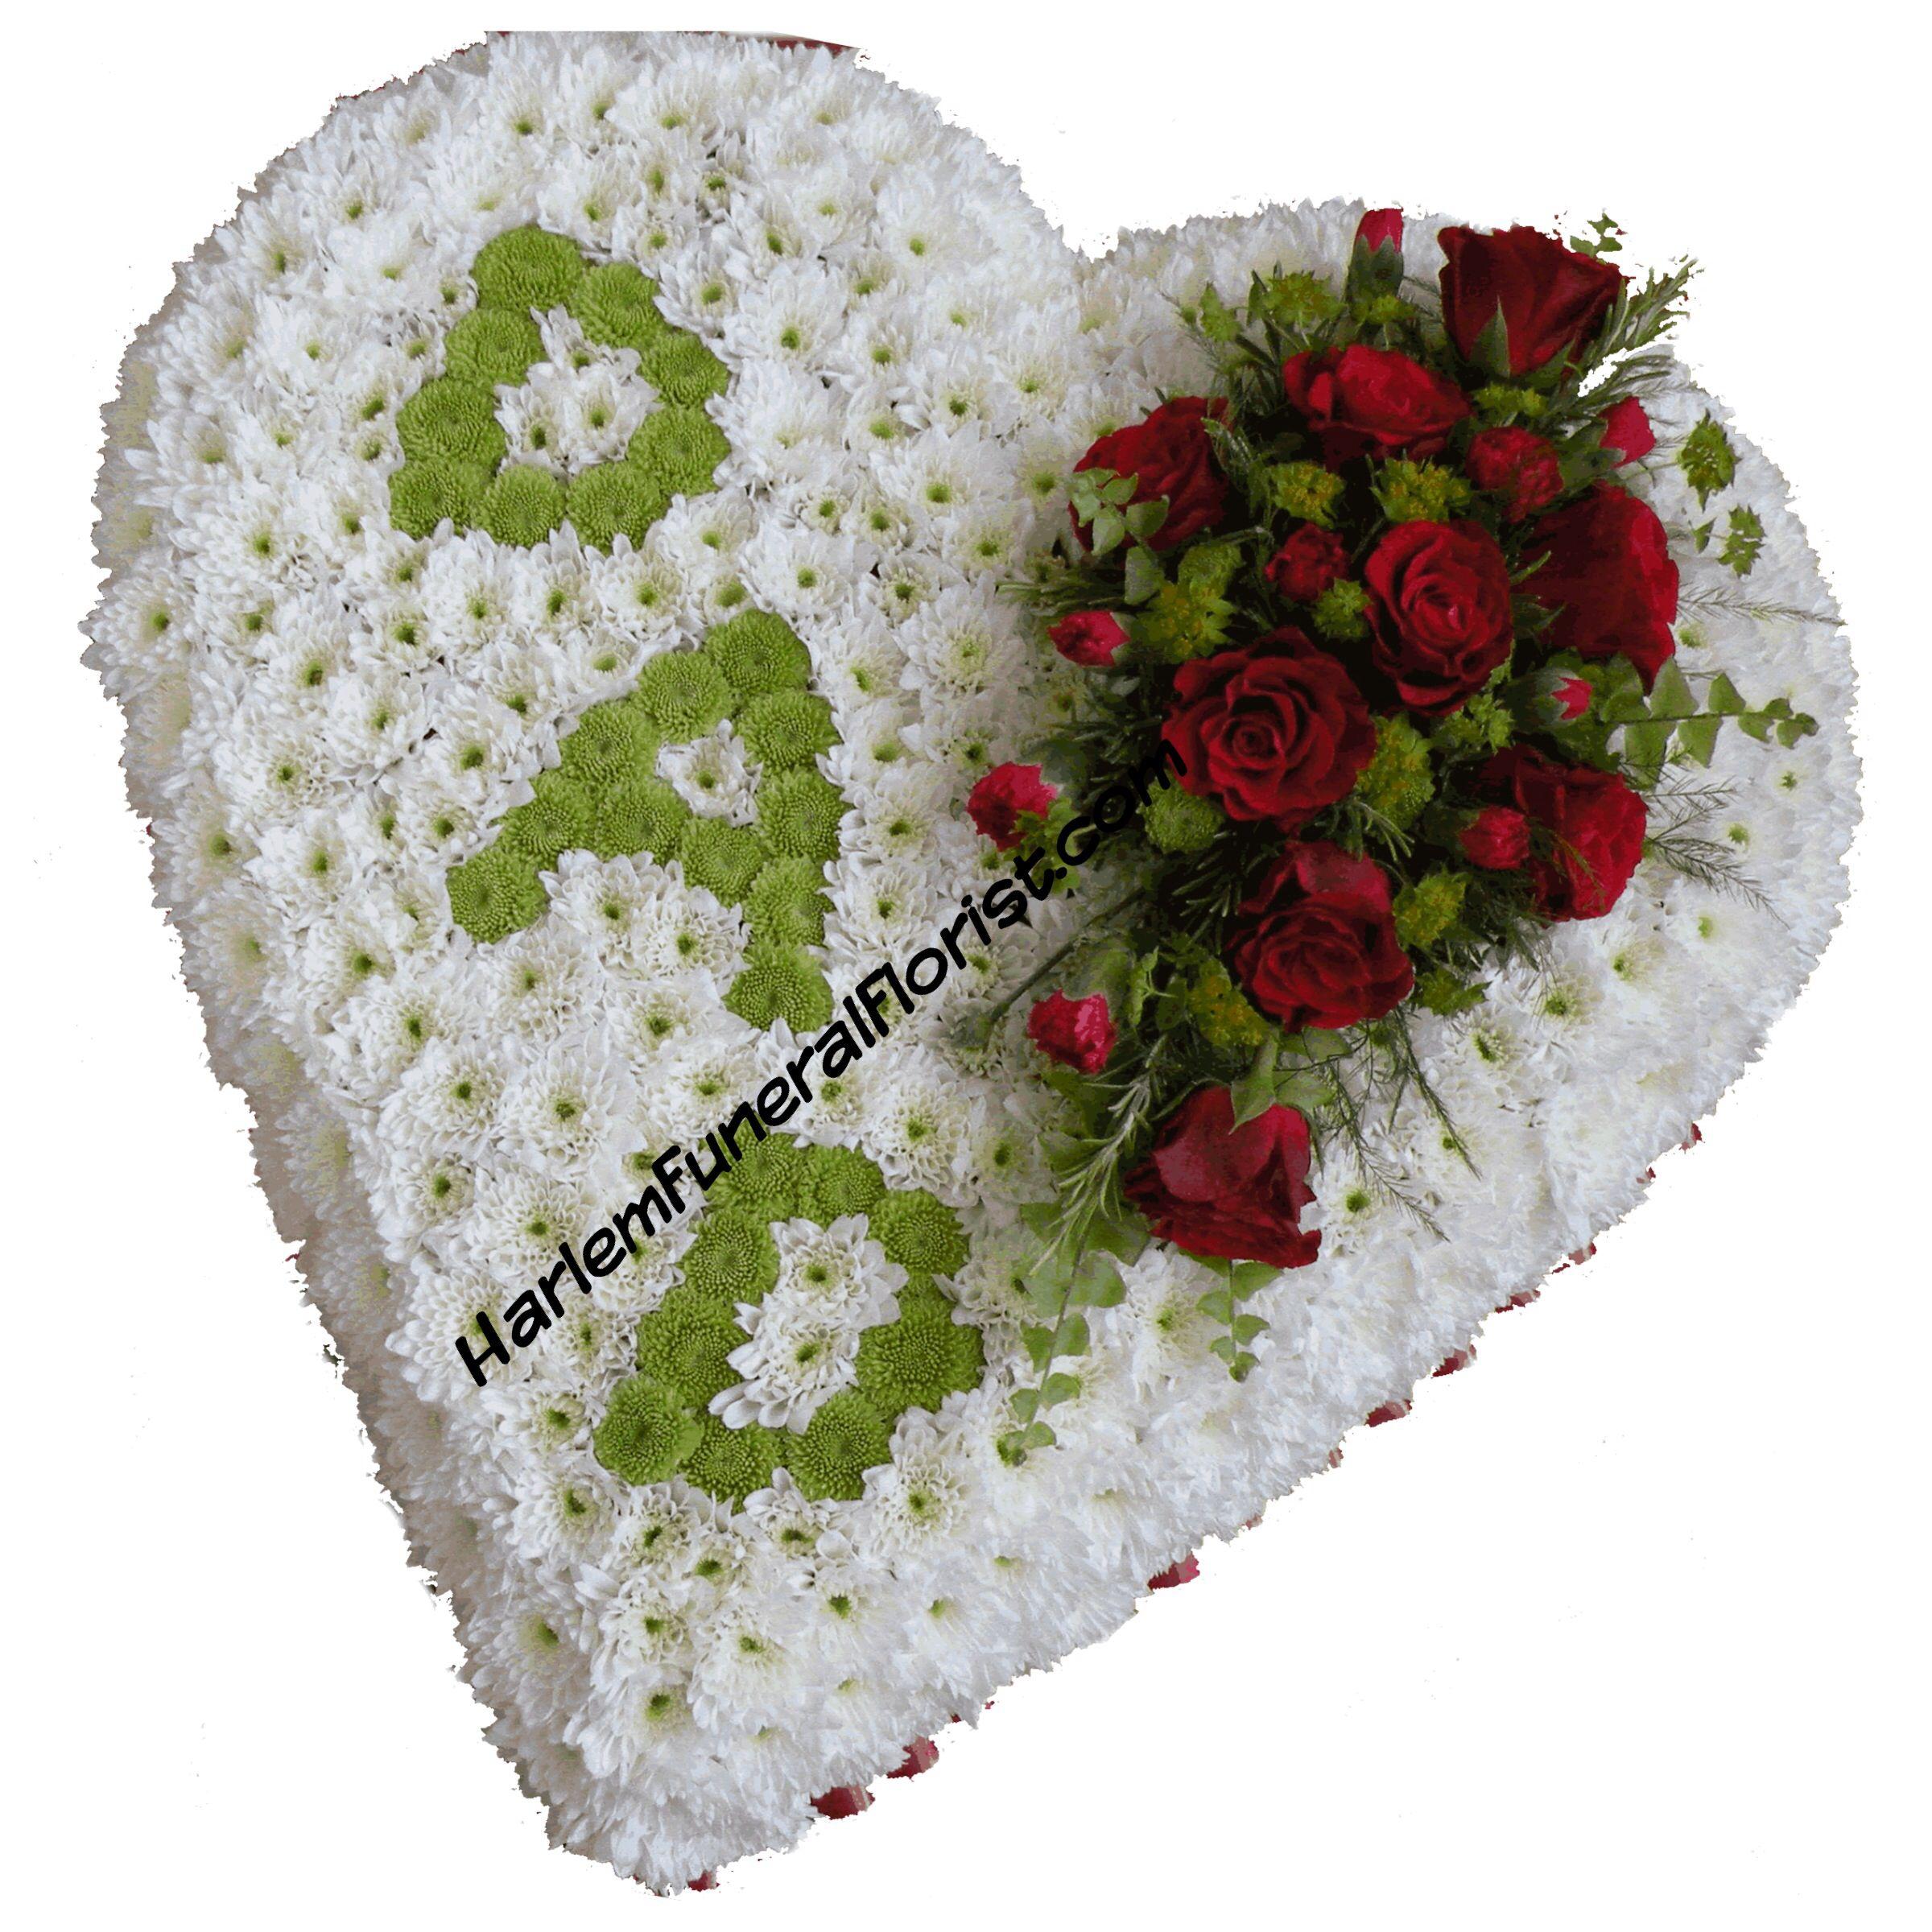 """DAD"" Heart Funeral flower arrangements, Funeral flowers"